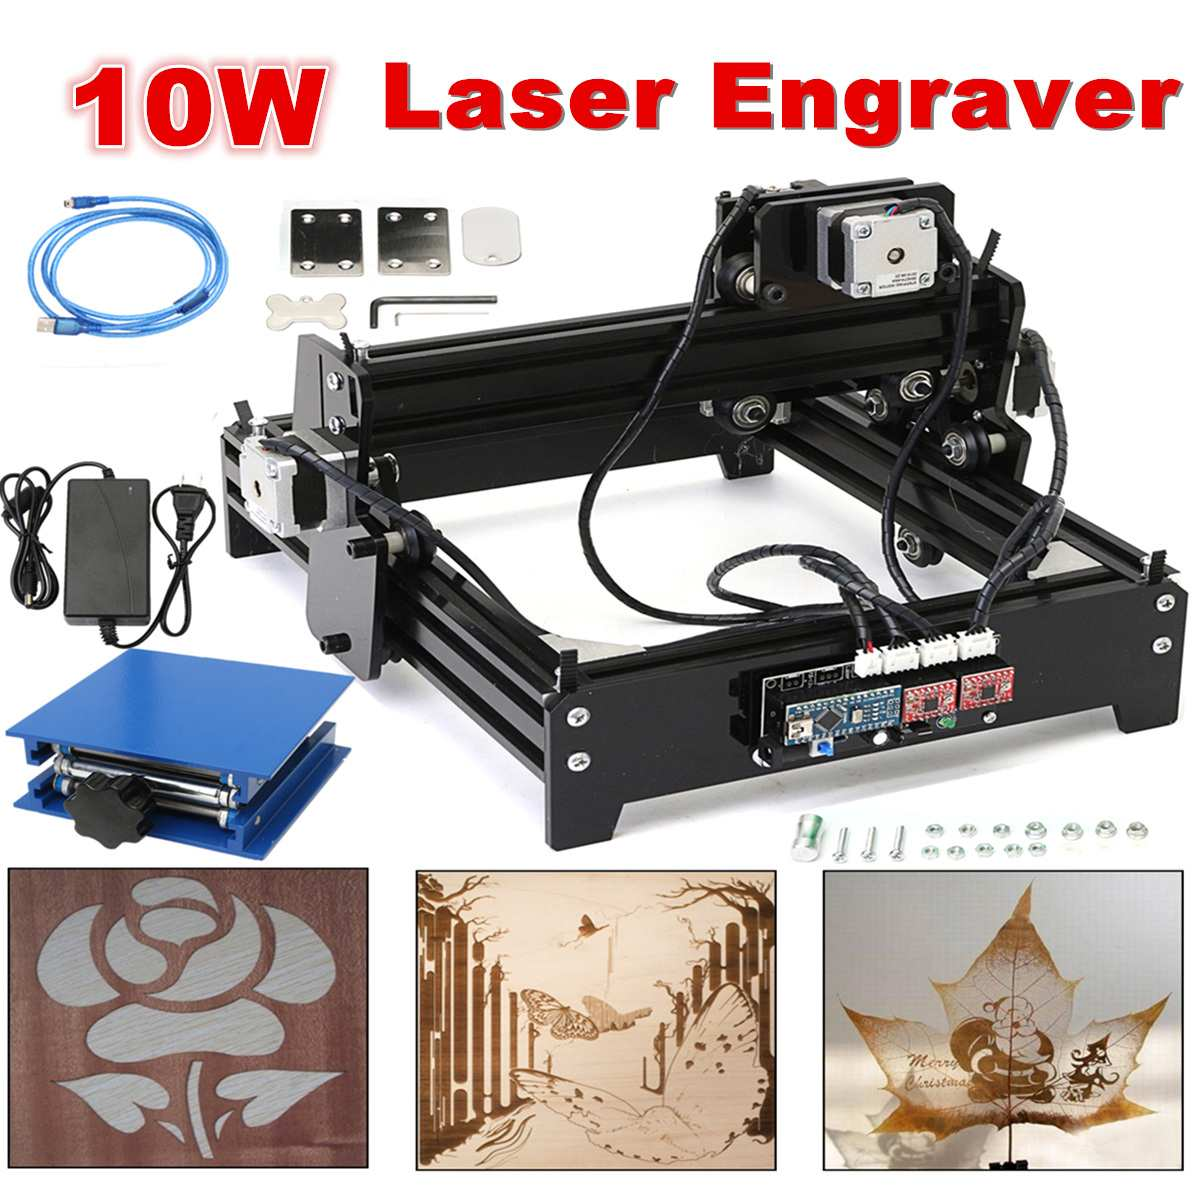 10W Engraving Area USB Desktop Metal Stone Wood CNC Laser Engraver Marking Engraving Machine With Protective Glasses